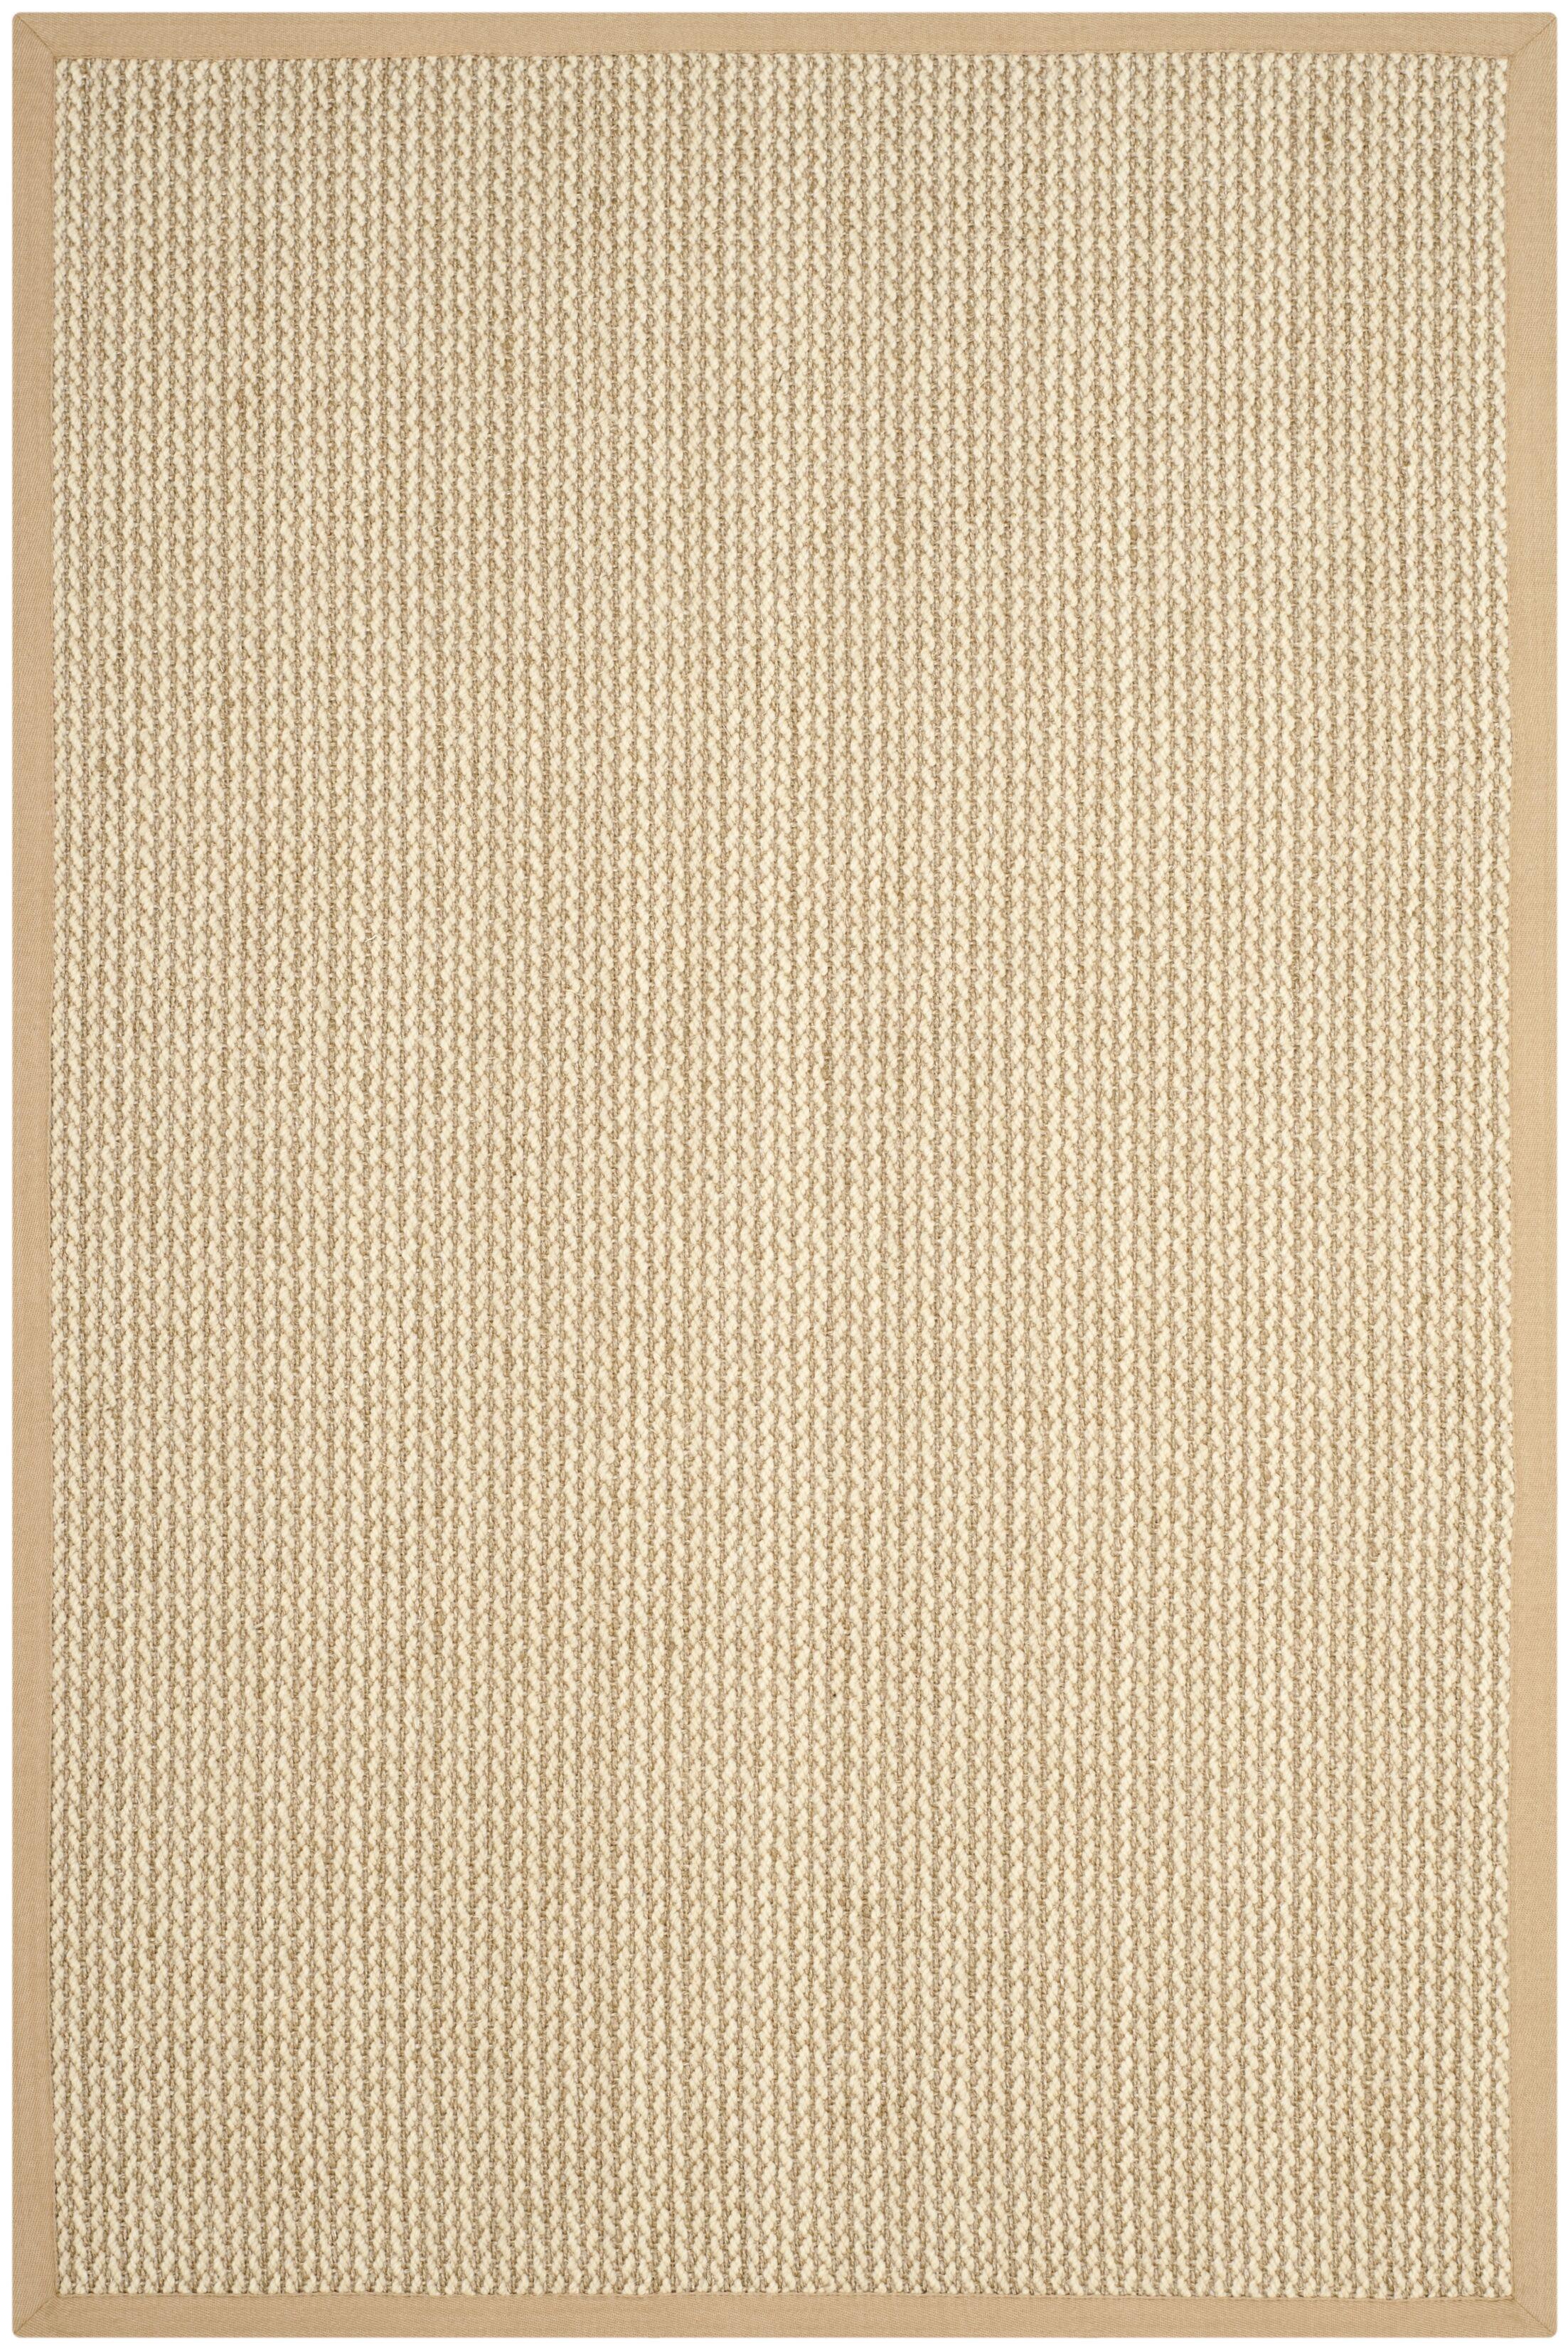 Hand-Woven Beige Area Rug Rug Size: Rectangle 9' x 12'